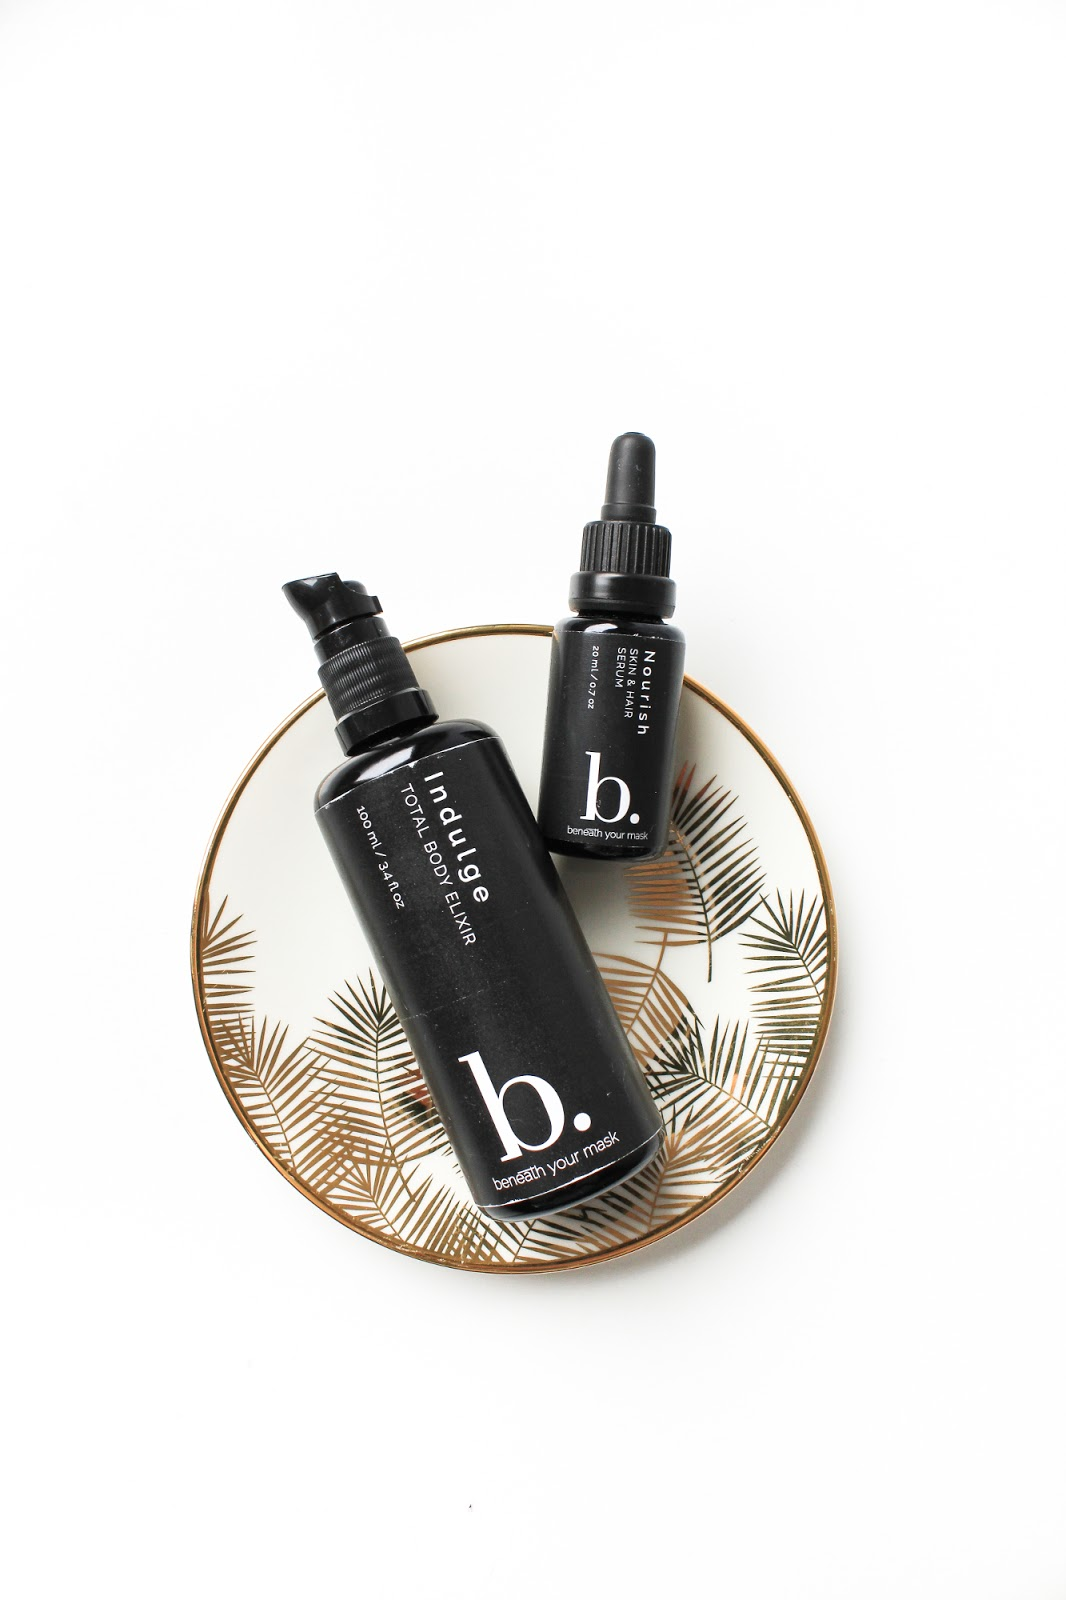 March Clean Beauty Box Indulge Beneath Your Mask Indulge Total Body Elixir, Nourish Skin + Hair Serum